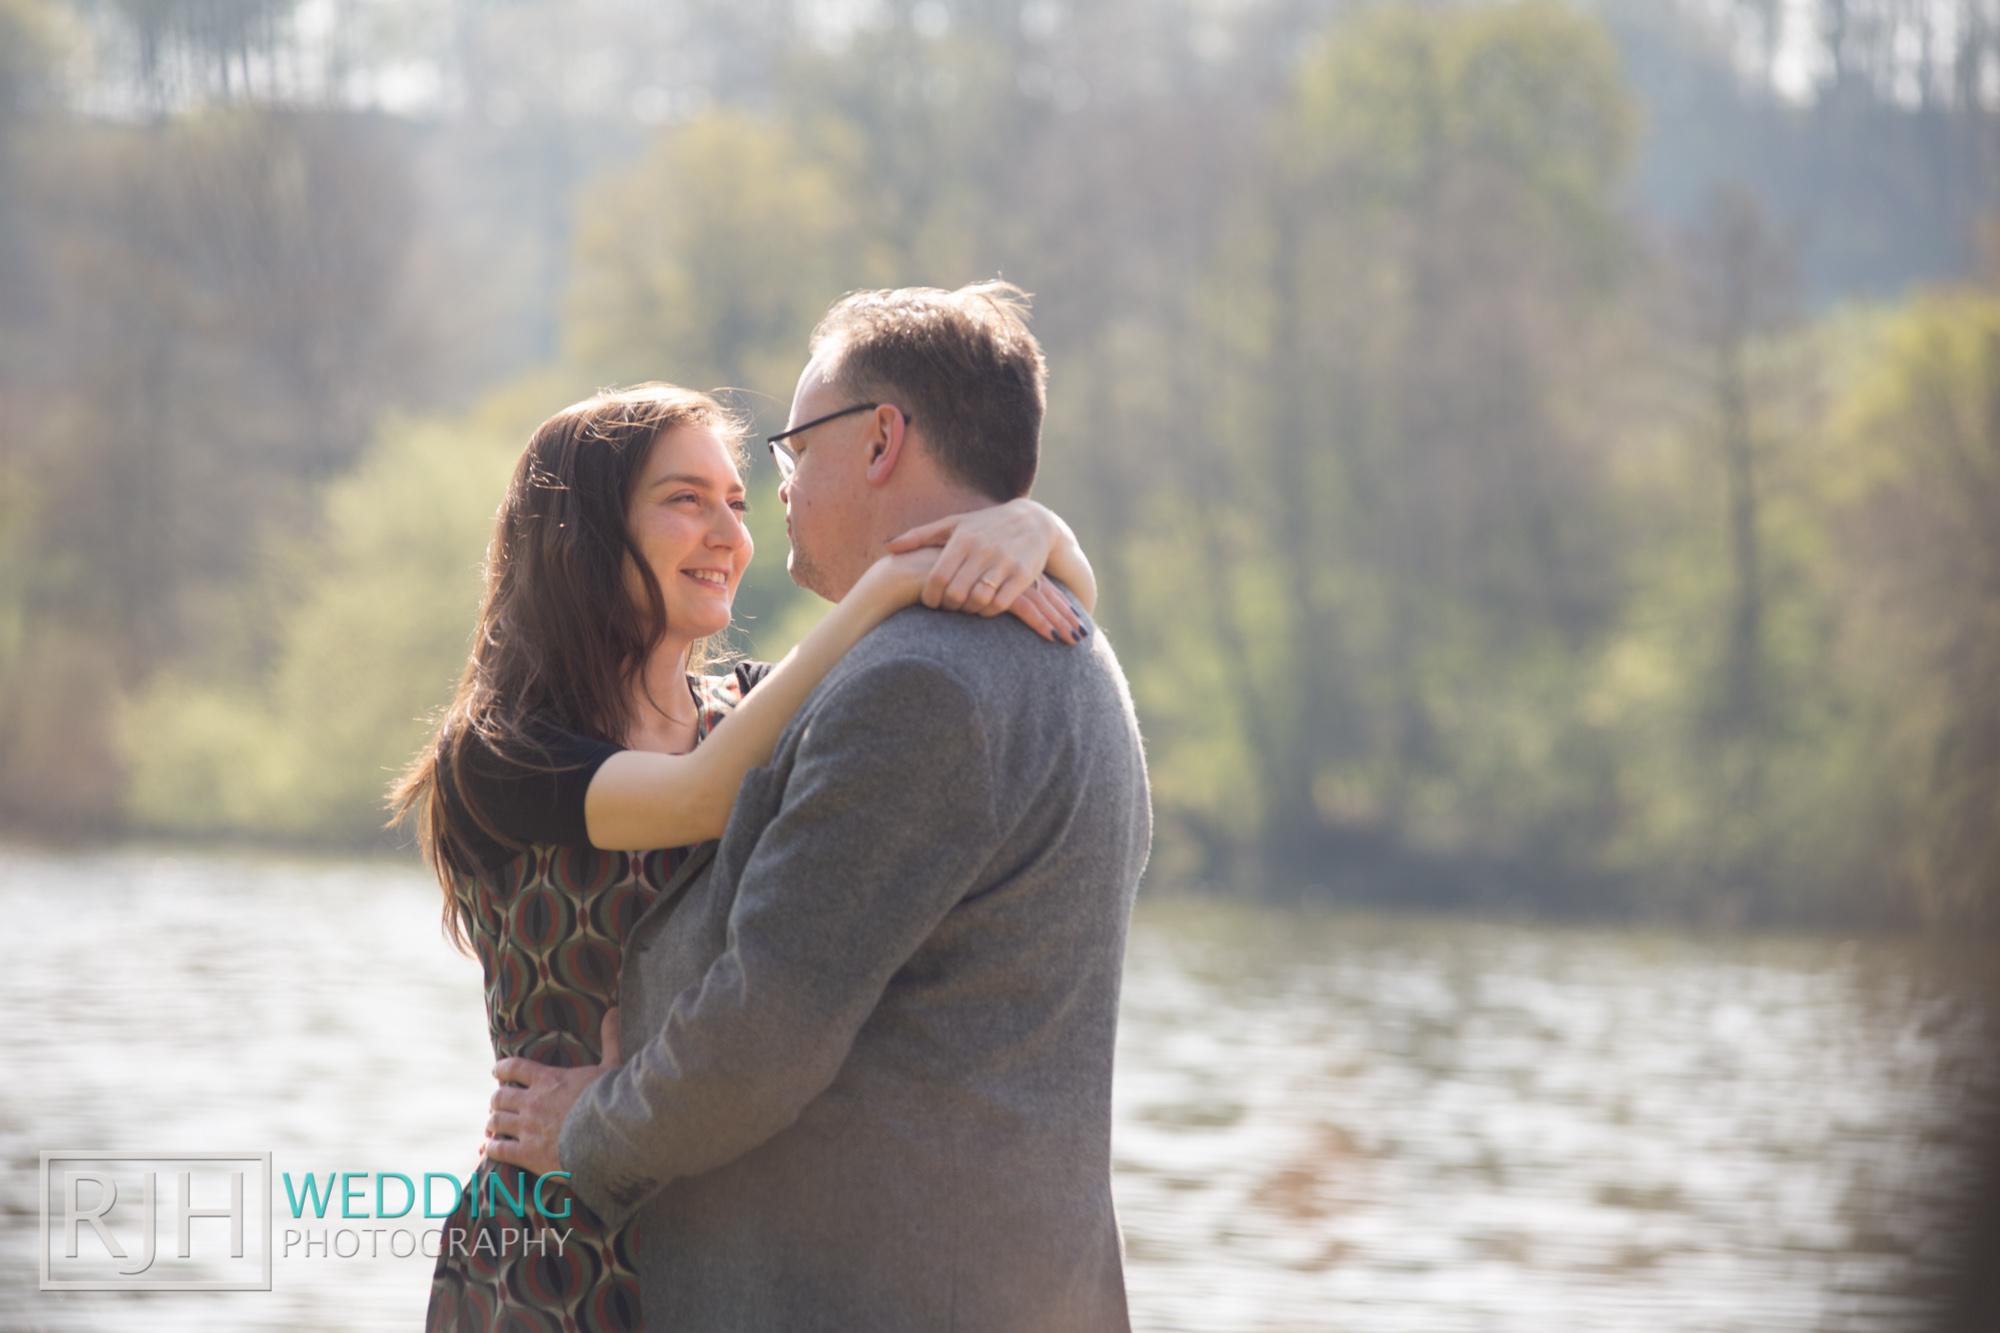 Pre-wedding photography - Richard & Rachel_014_3C2A8194.jpg